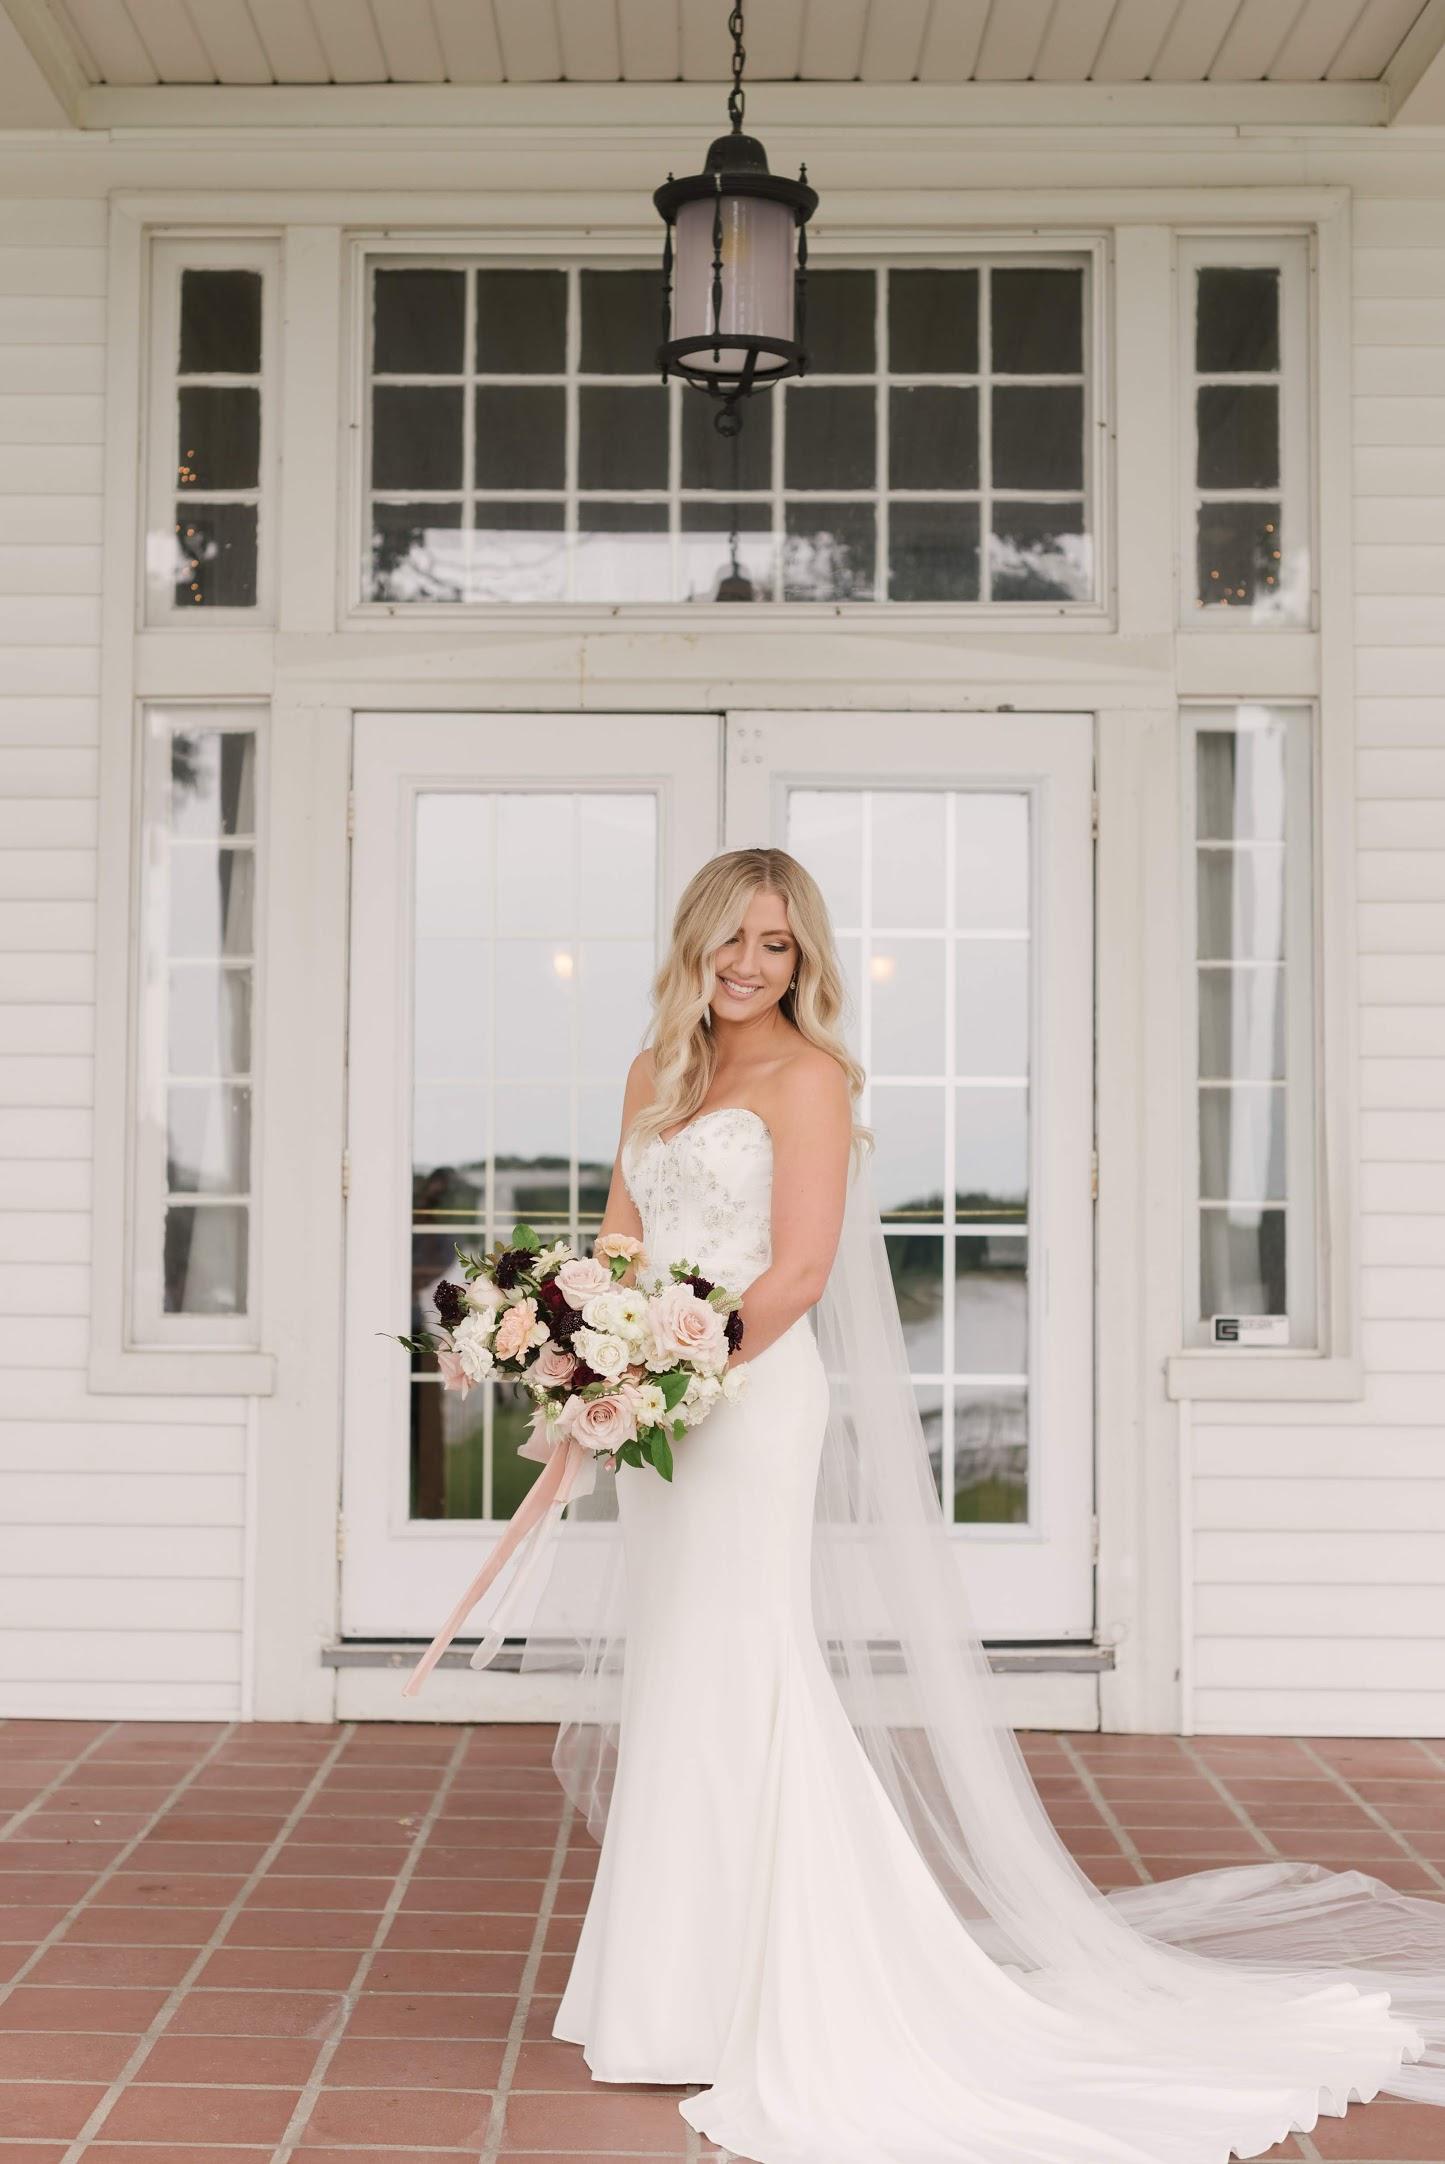 Field-Gems-Photography-Detroit-Michigan-Wedding-Photographer-Family-Photographer-Photobooth-090818-325.jpg